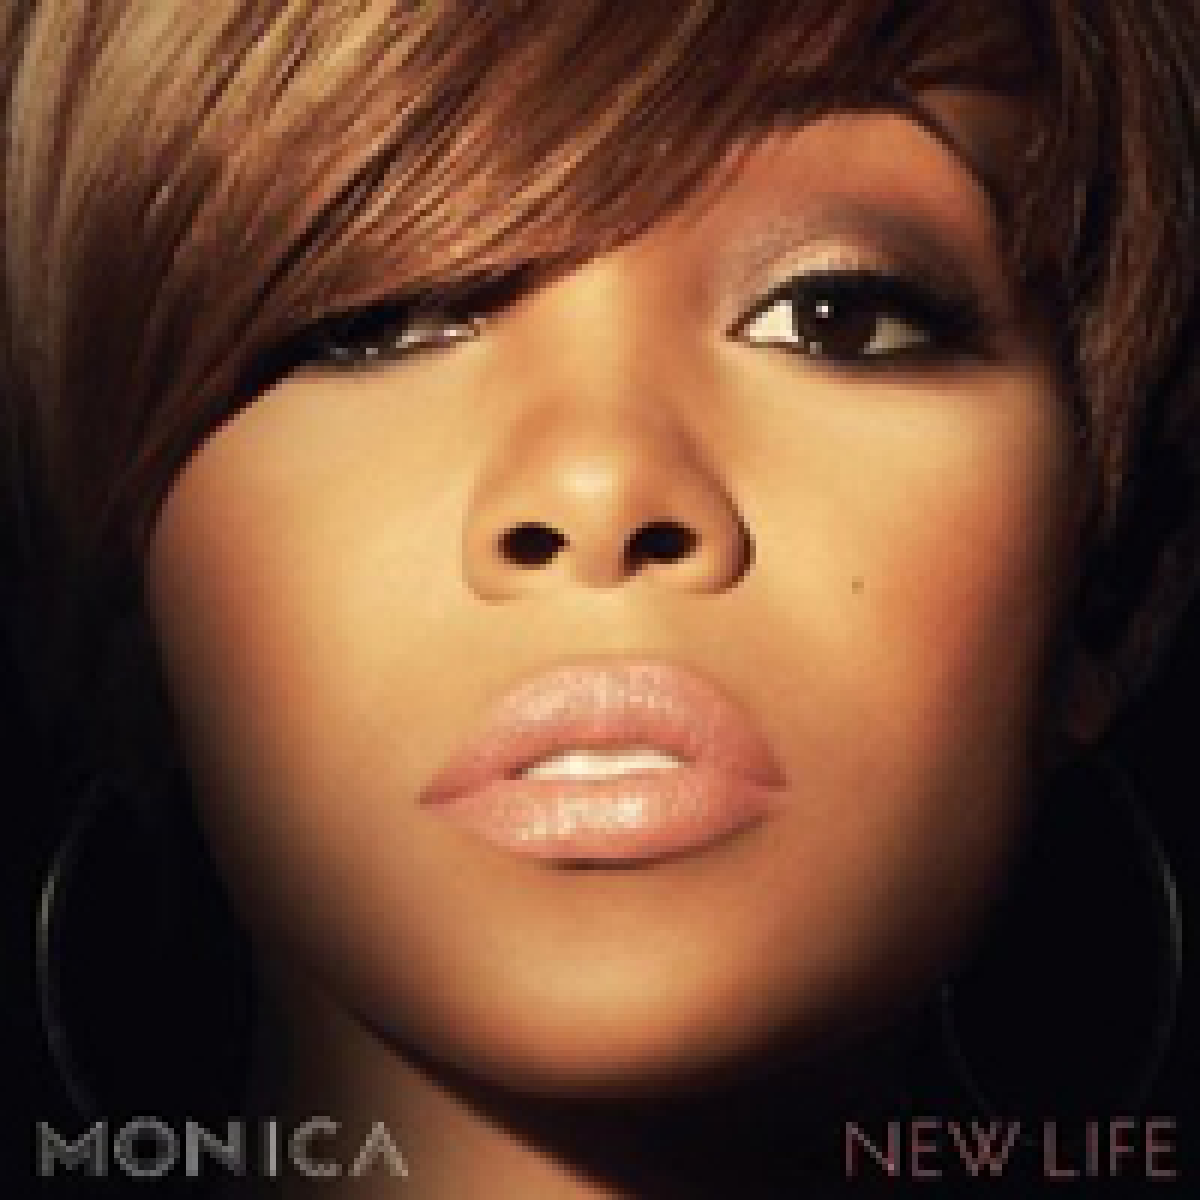 Monica, New Life